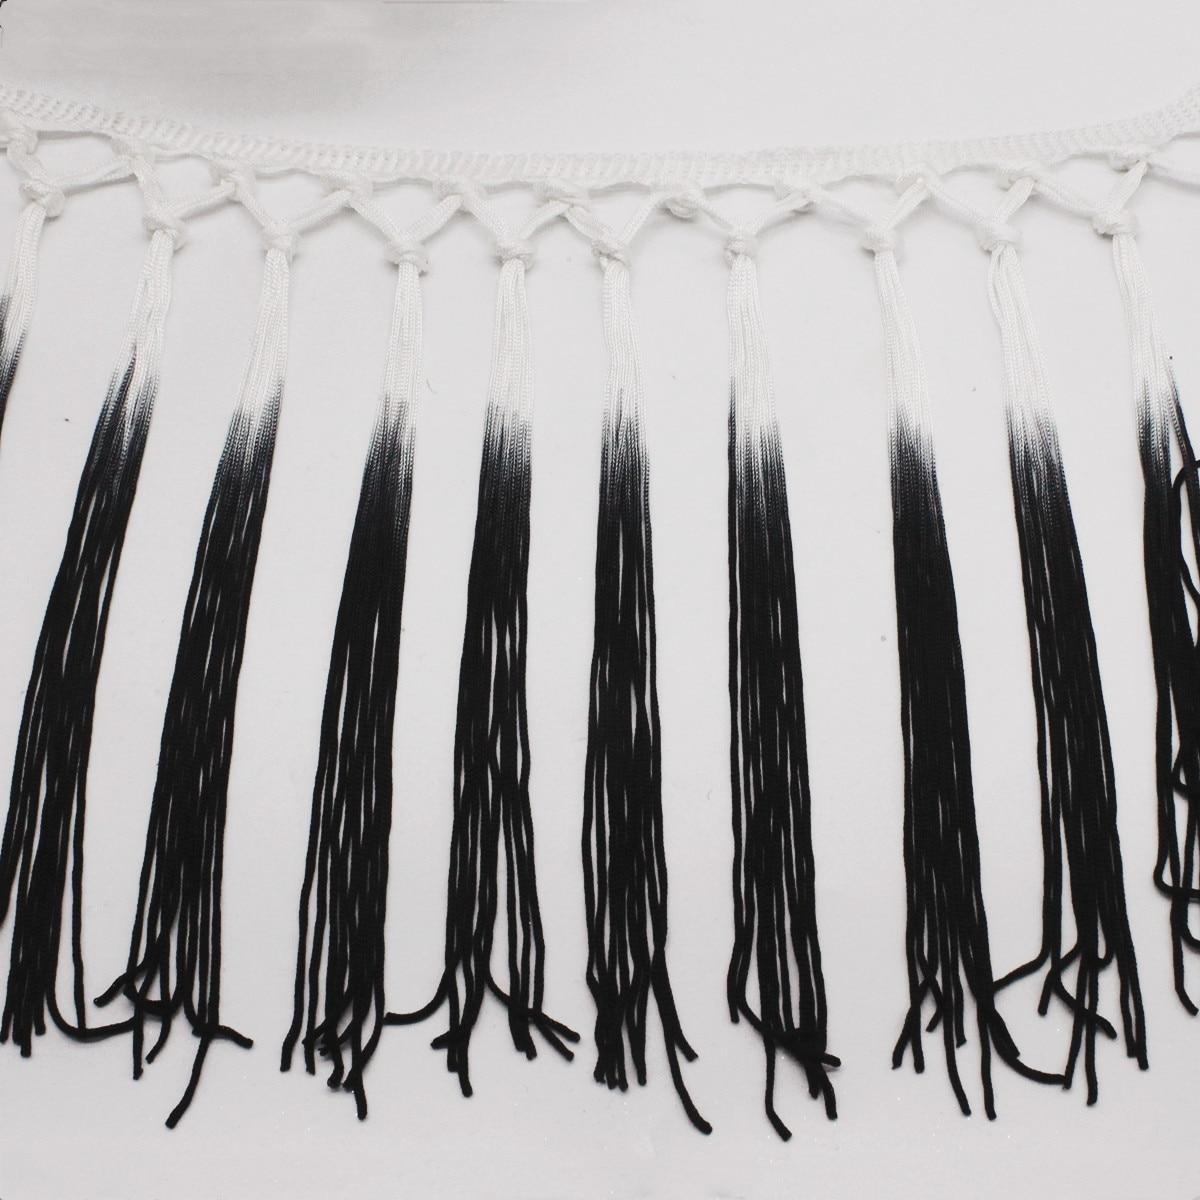 Yackalasi 3 Yds/lote flecos borla nudo 100% rayón Latino flecos Blanco/Negro Lain vestido flecos recorte 15cm